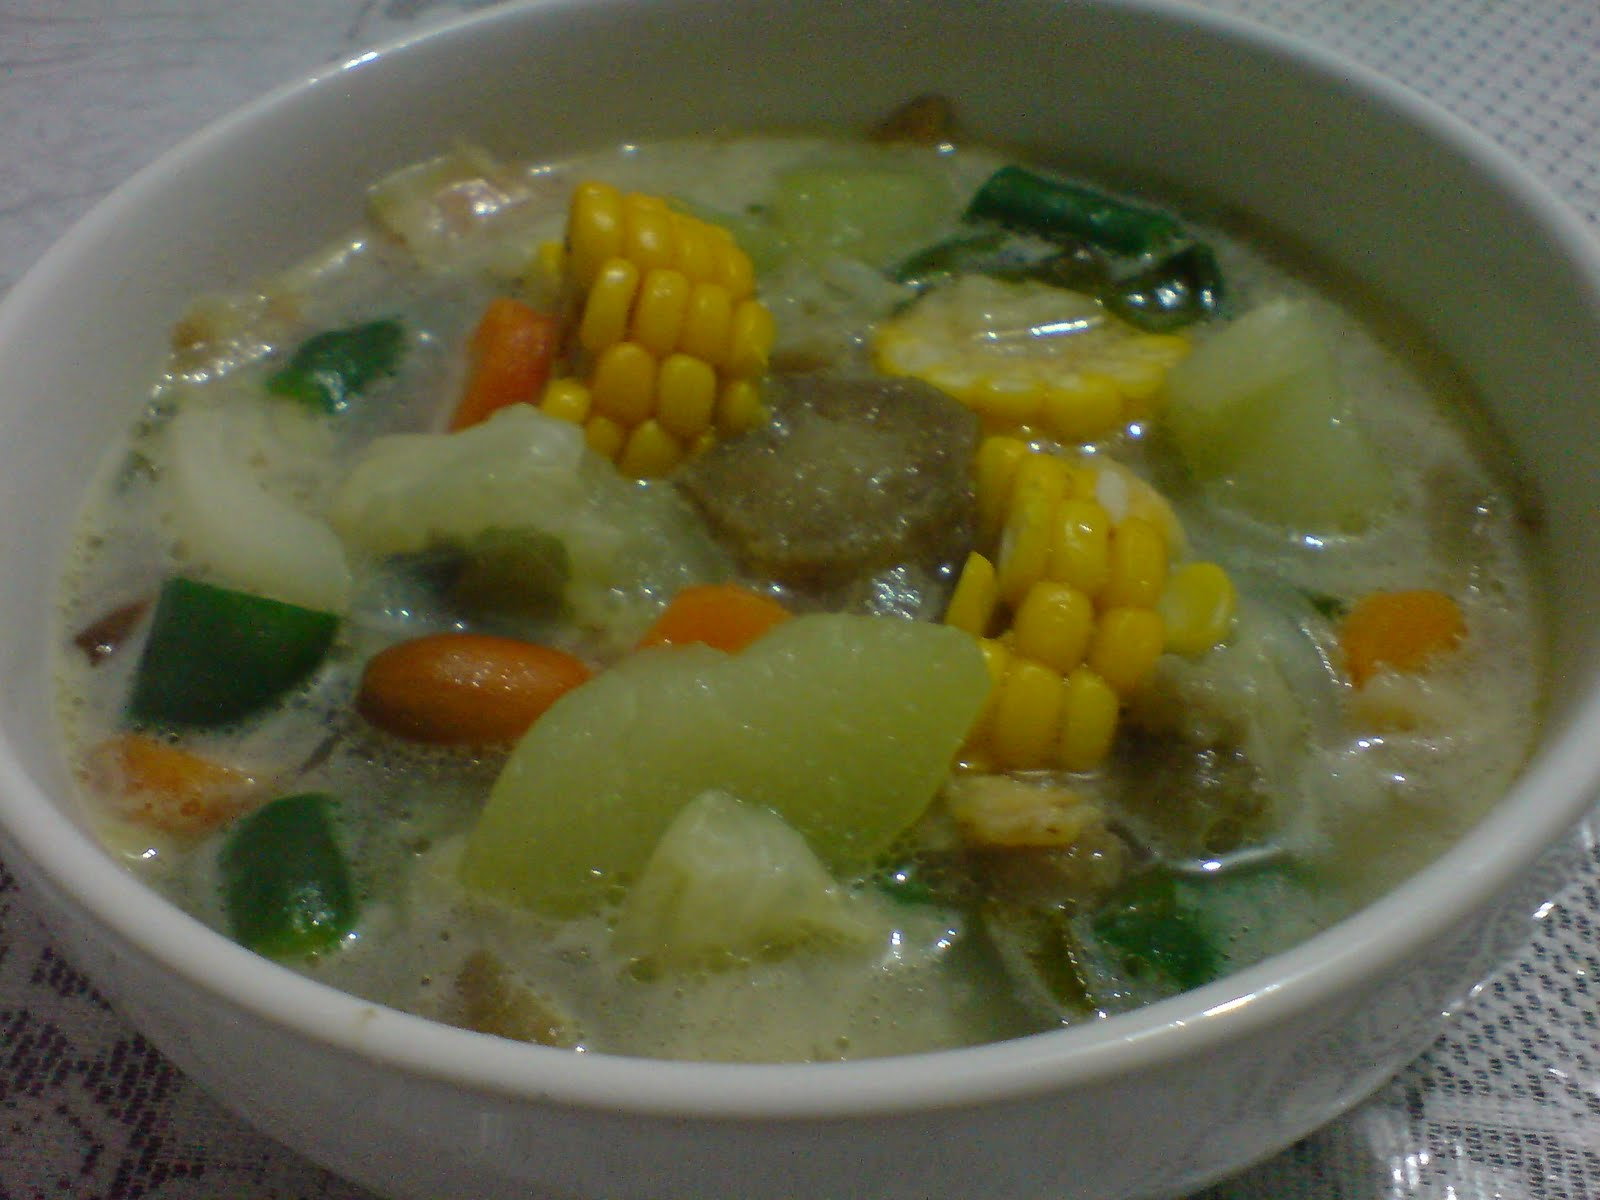 resep-lodeh-jagung-muda